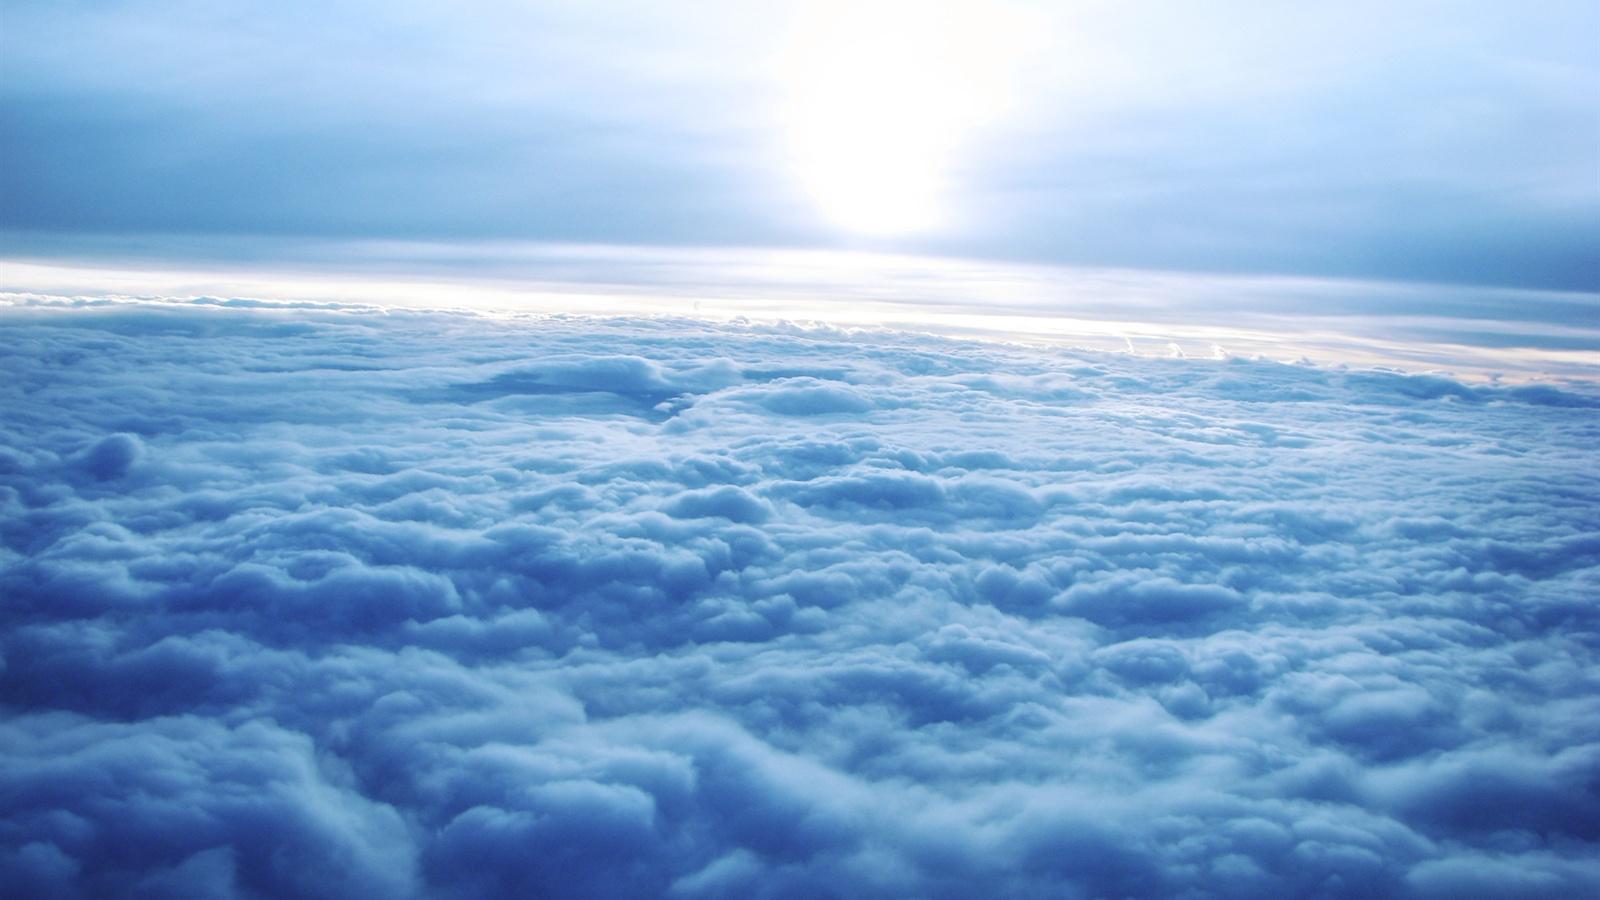 sky wallpaper 1600 x 900 - photo #14